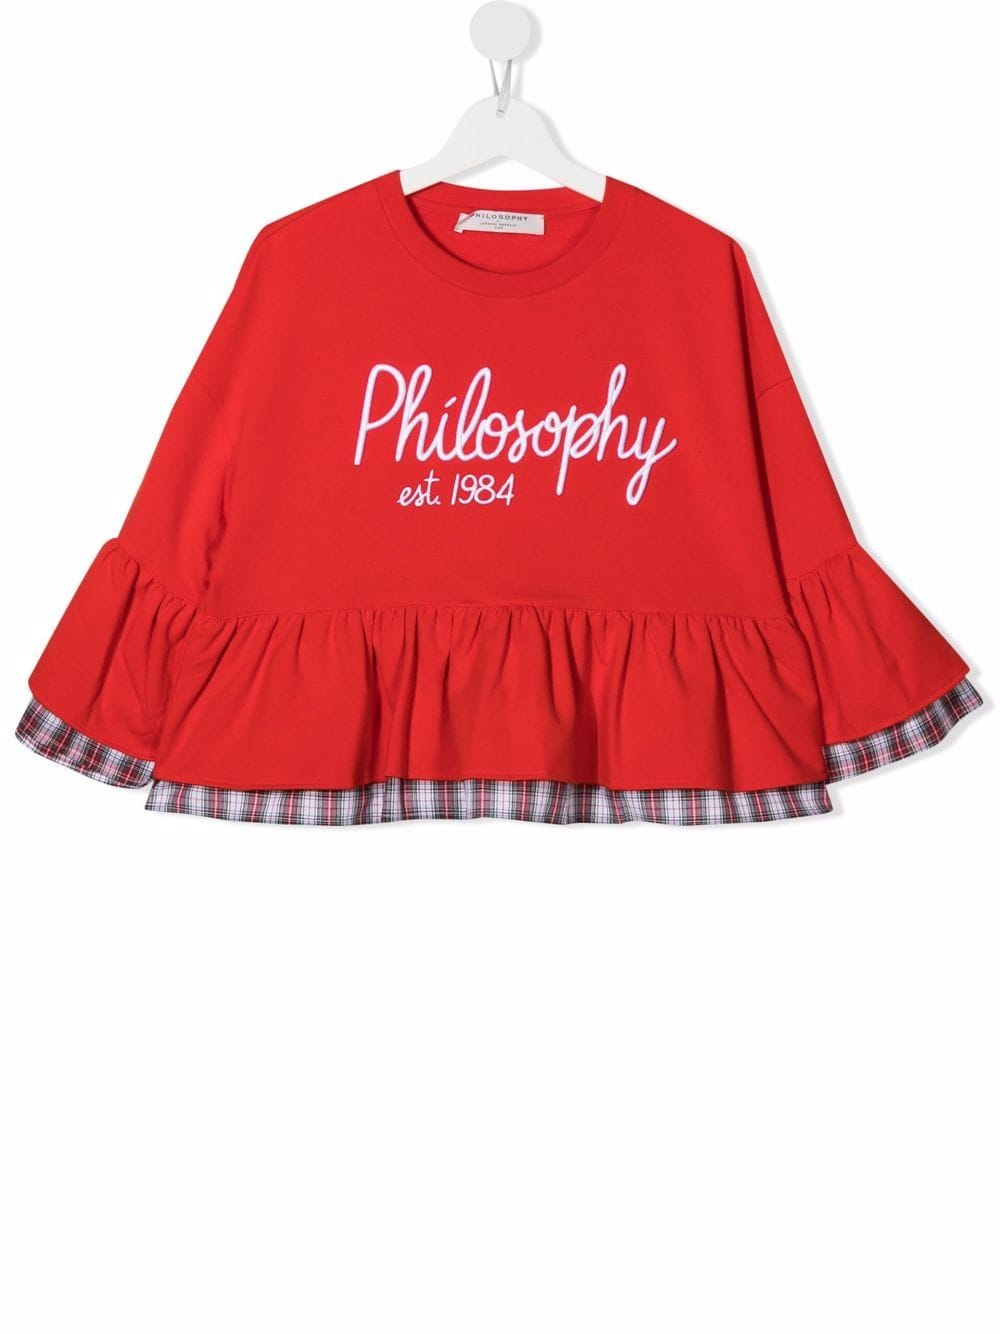 Philosofy kids   Sweatshirt   PJFE59FE147YP0343034T